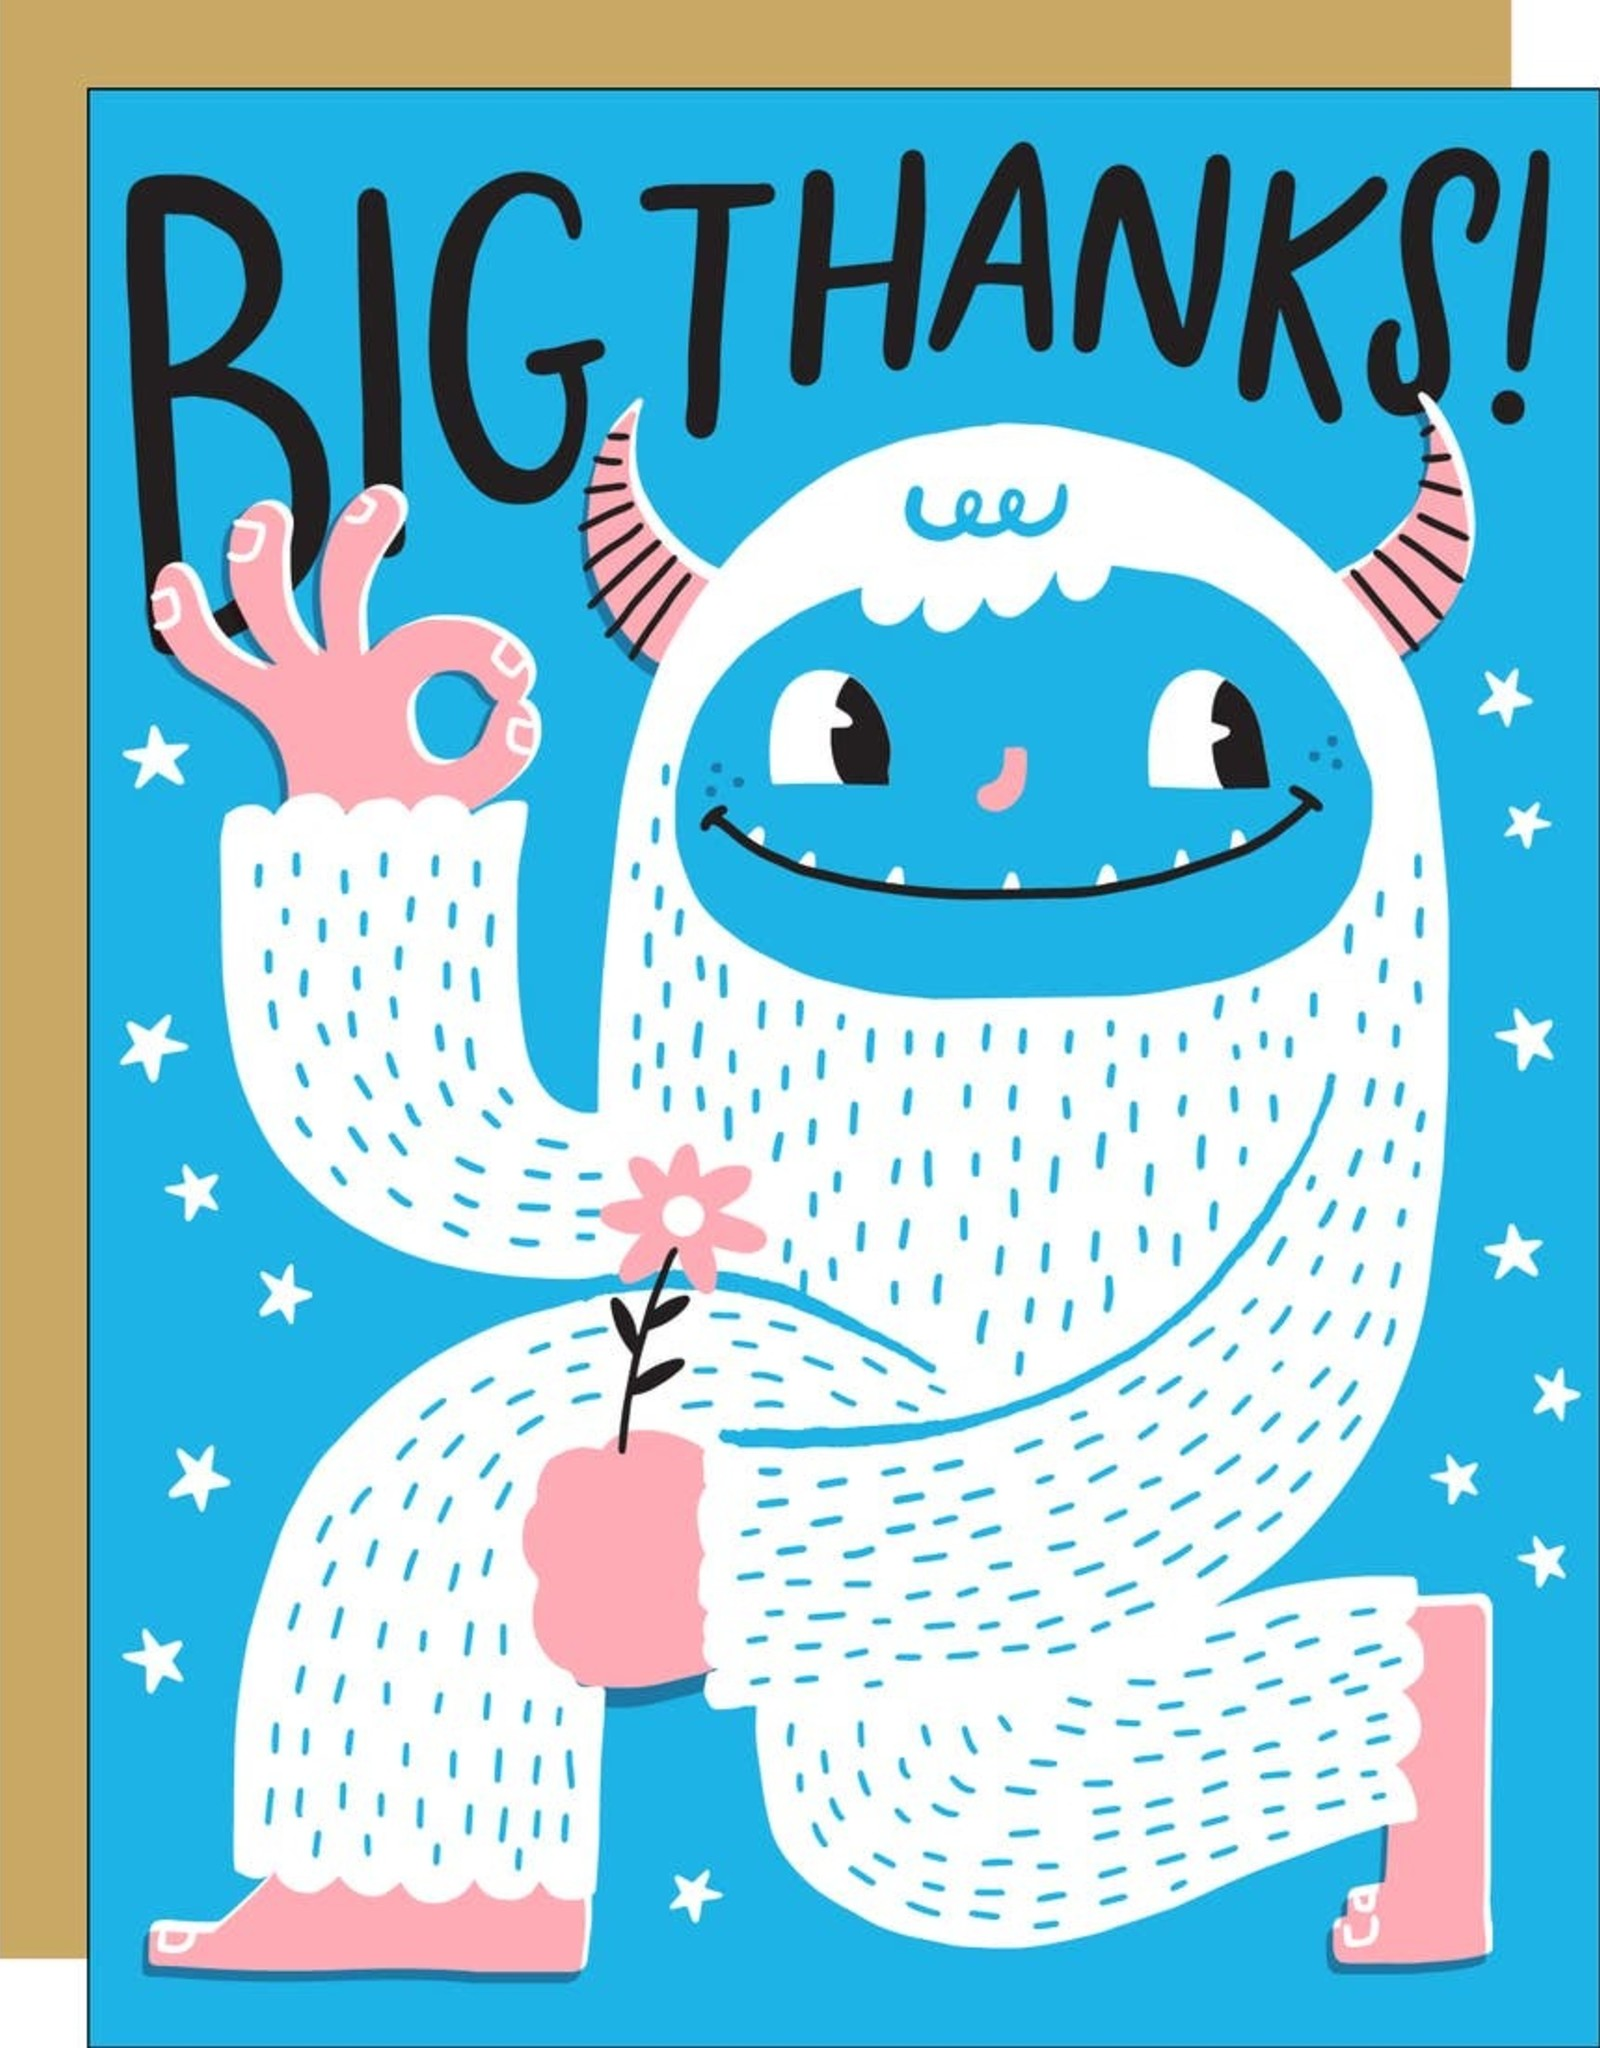 Egg Press Manufacturing Card - Thank you: Big thanks